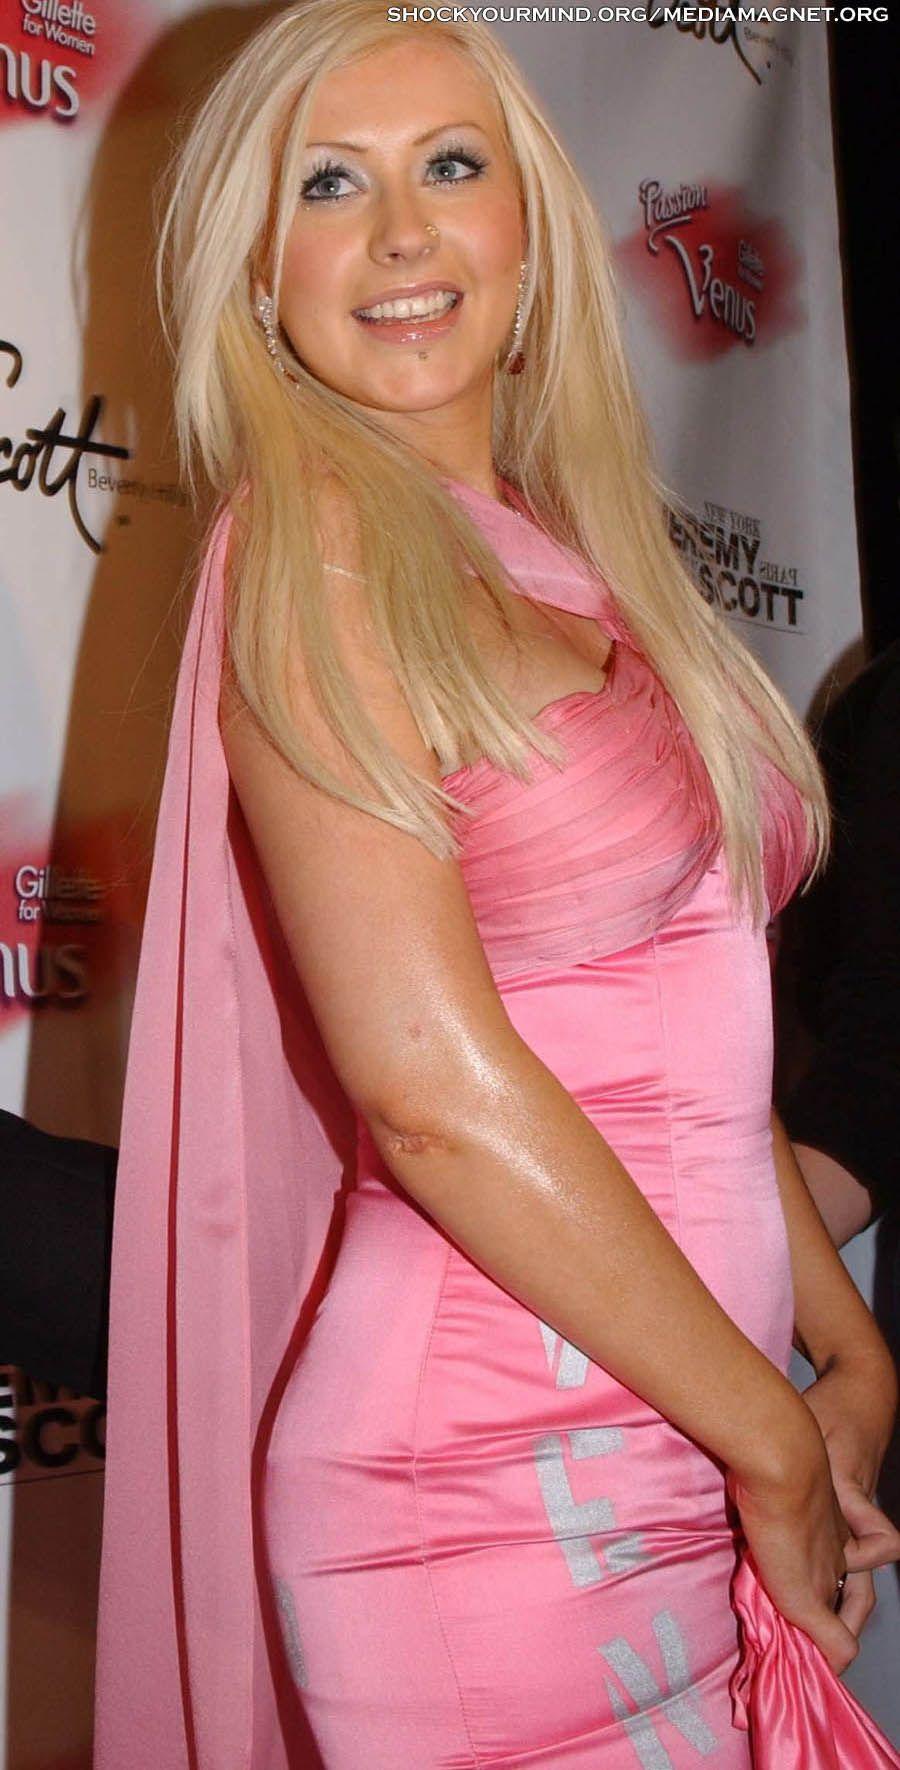 Christina Aguilera - Full Size - Page 21